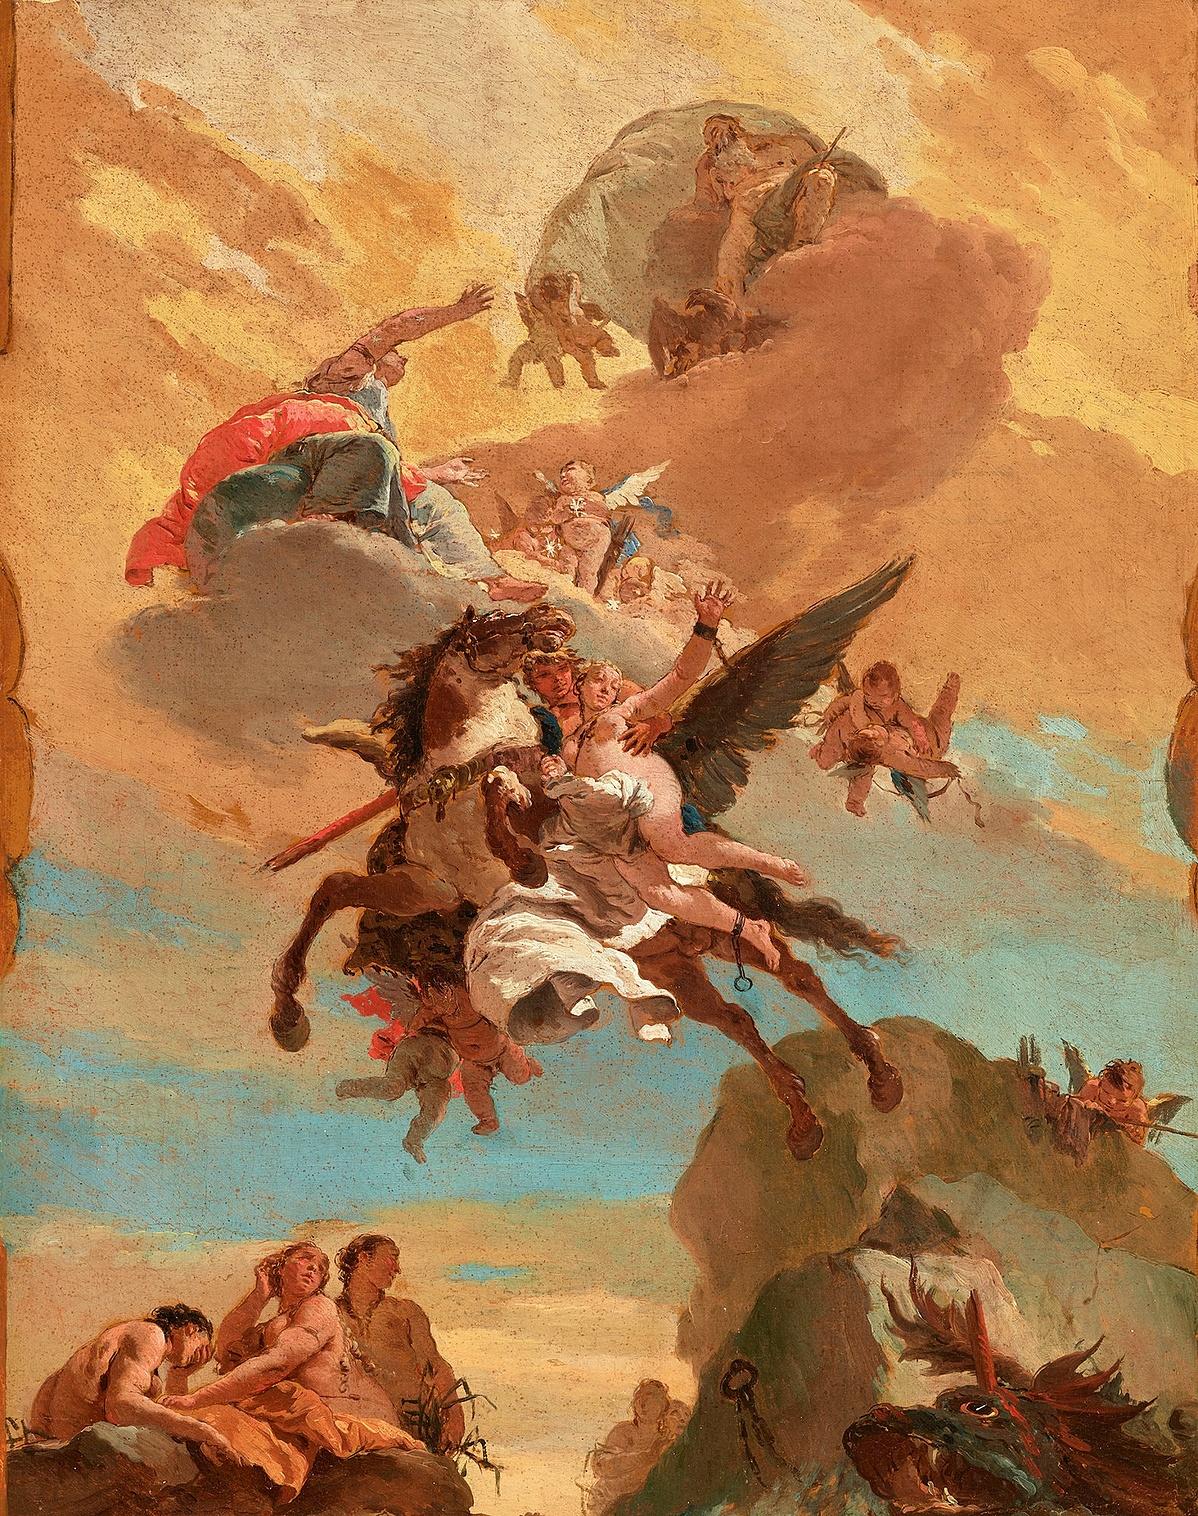 perseusandandromeda_milanesepalazzo_destroyed1943-163404.jpg